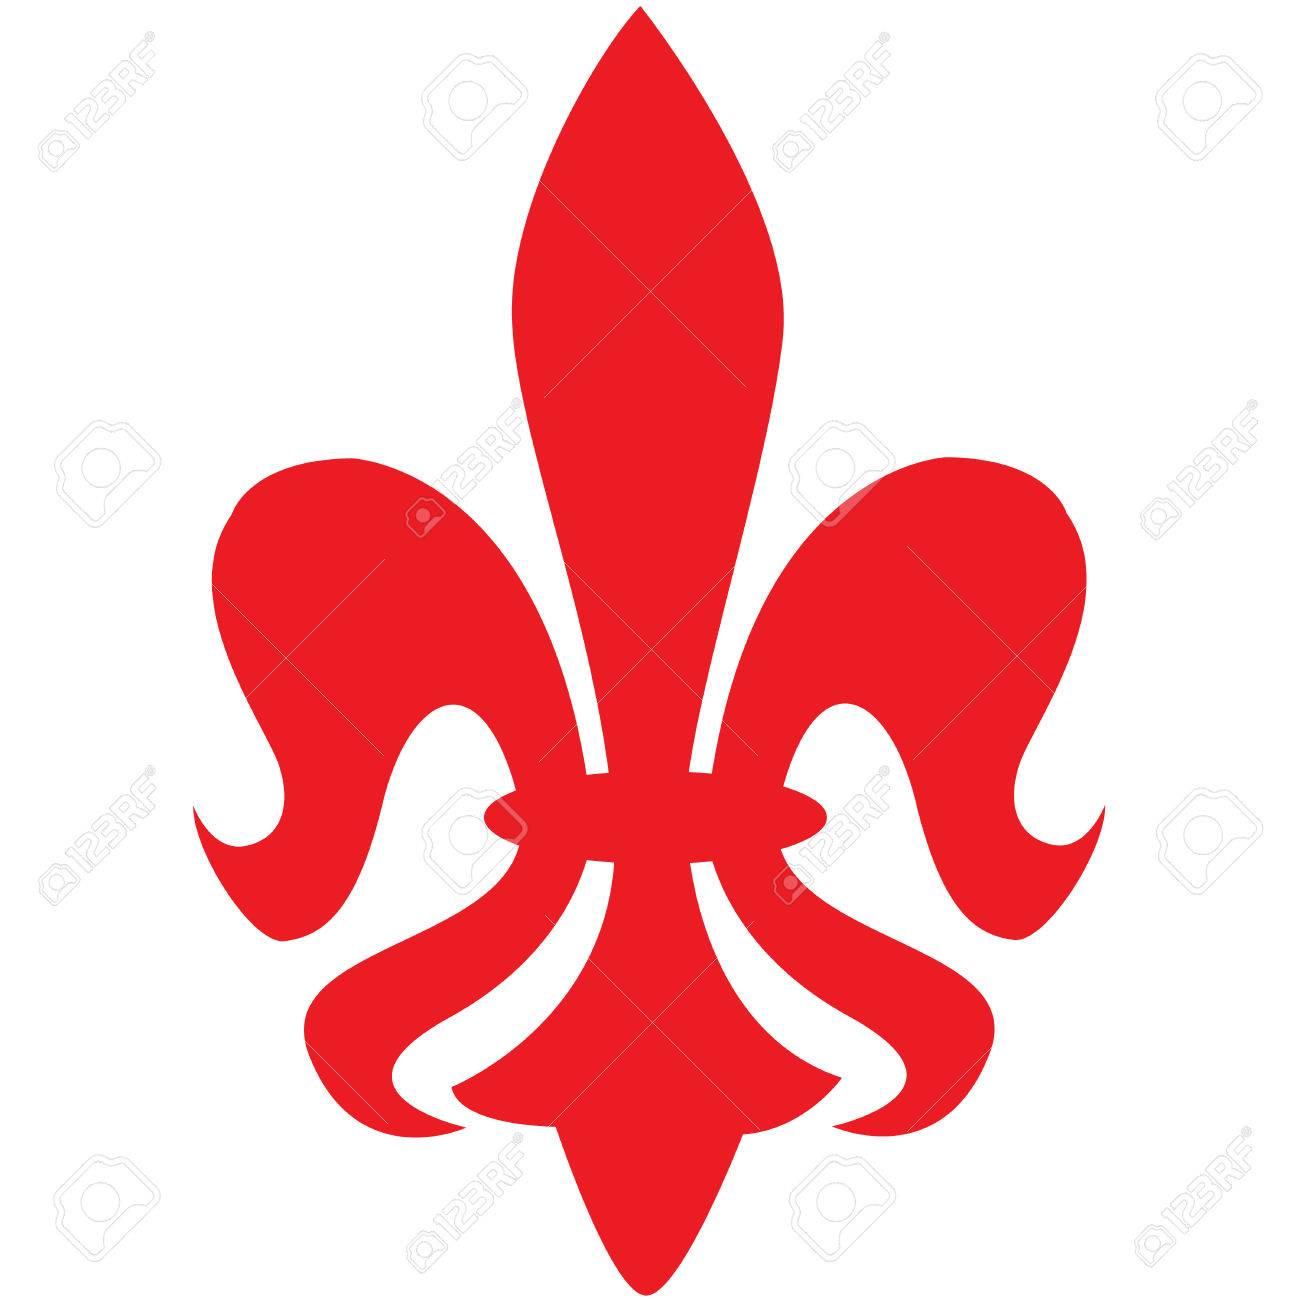 Red Fleur De Lys Symbol Royalty Free Cliparts Vectors And Stock